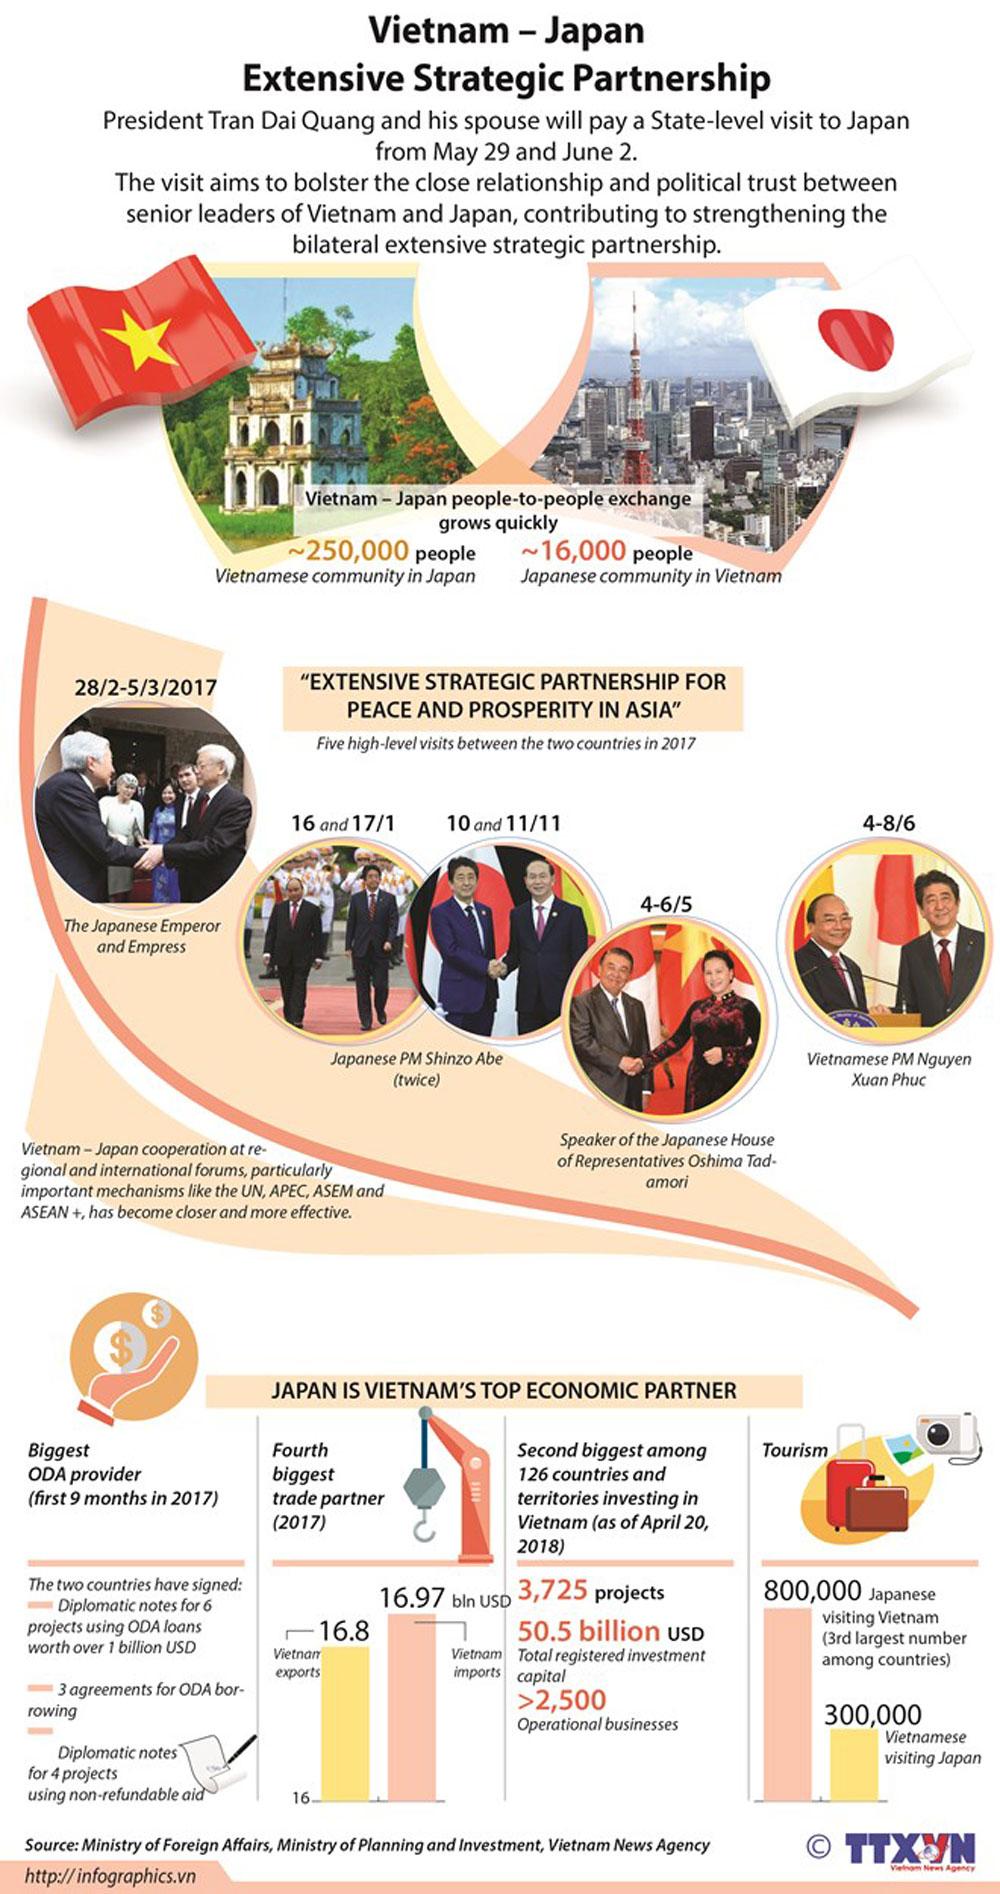 Vietnam, Japan, Extensive Strategic Partnership, President Tran Dai Quang, State-level visit, close relationship, political trust, senior leaders